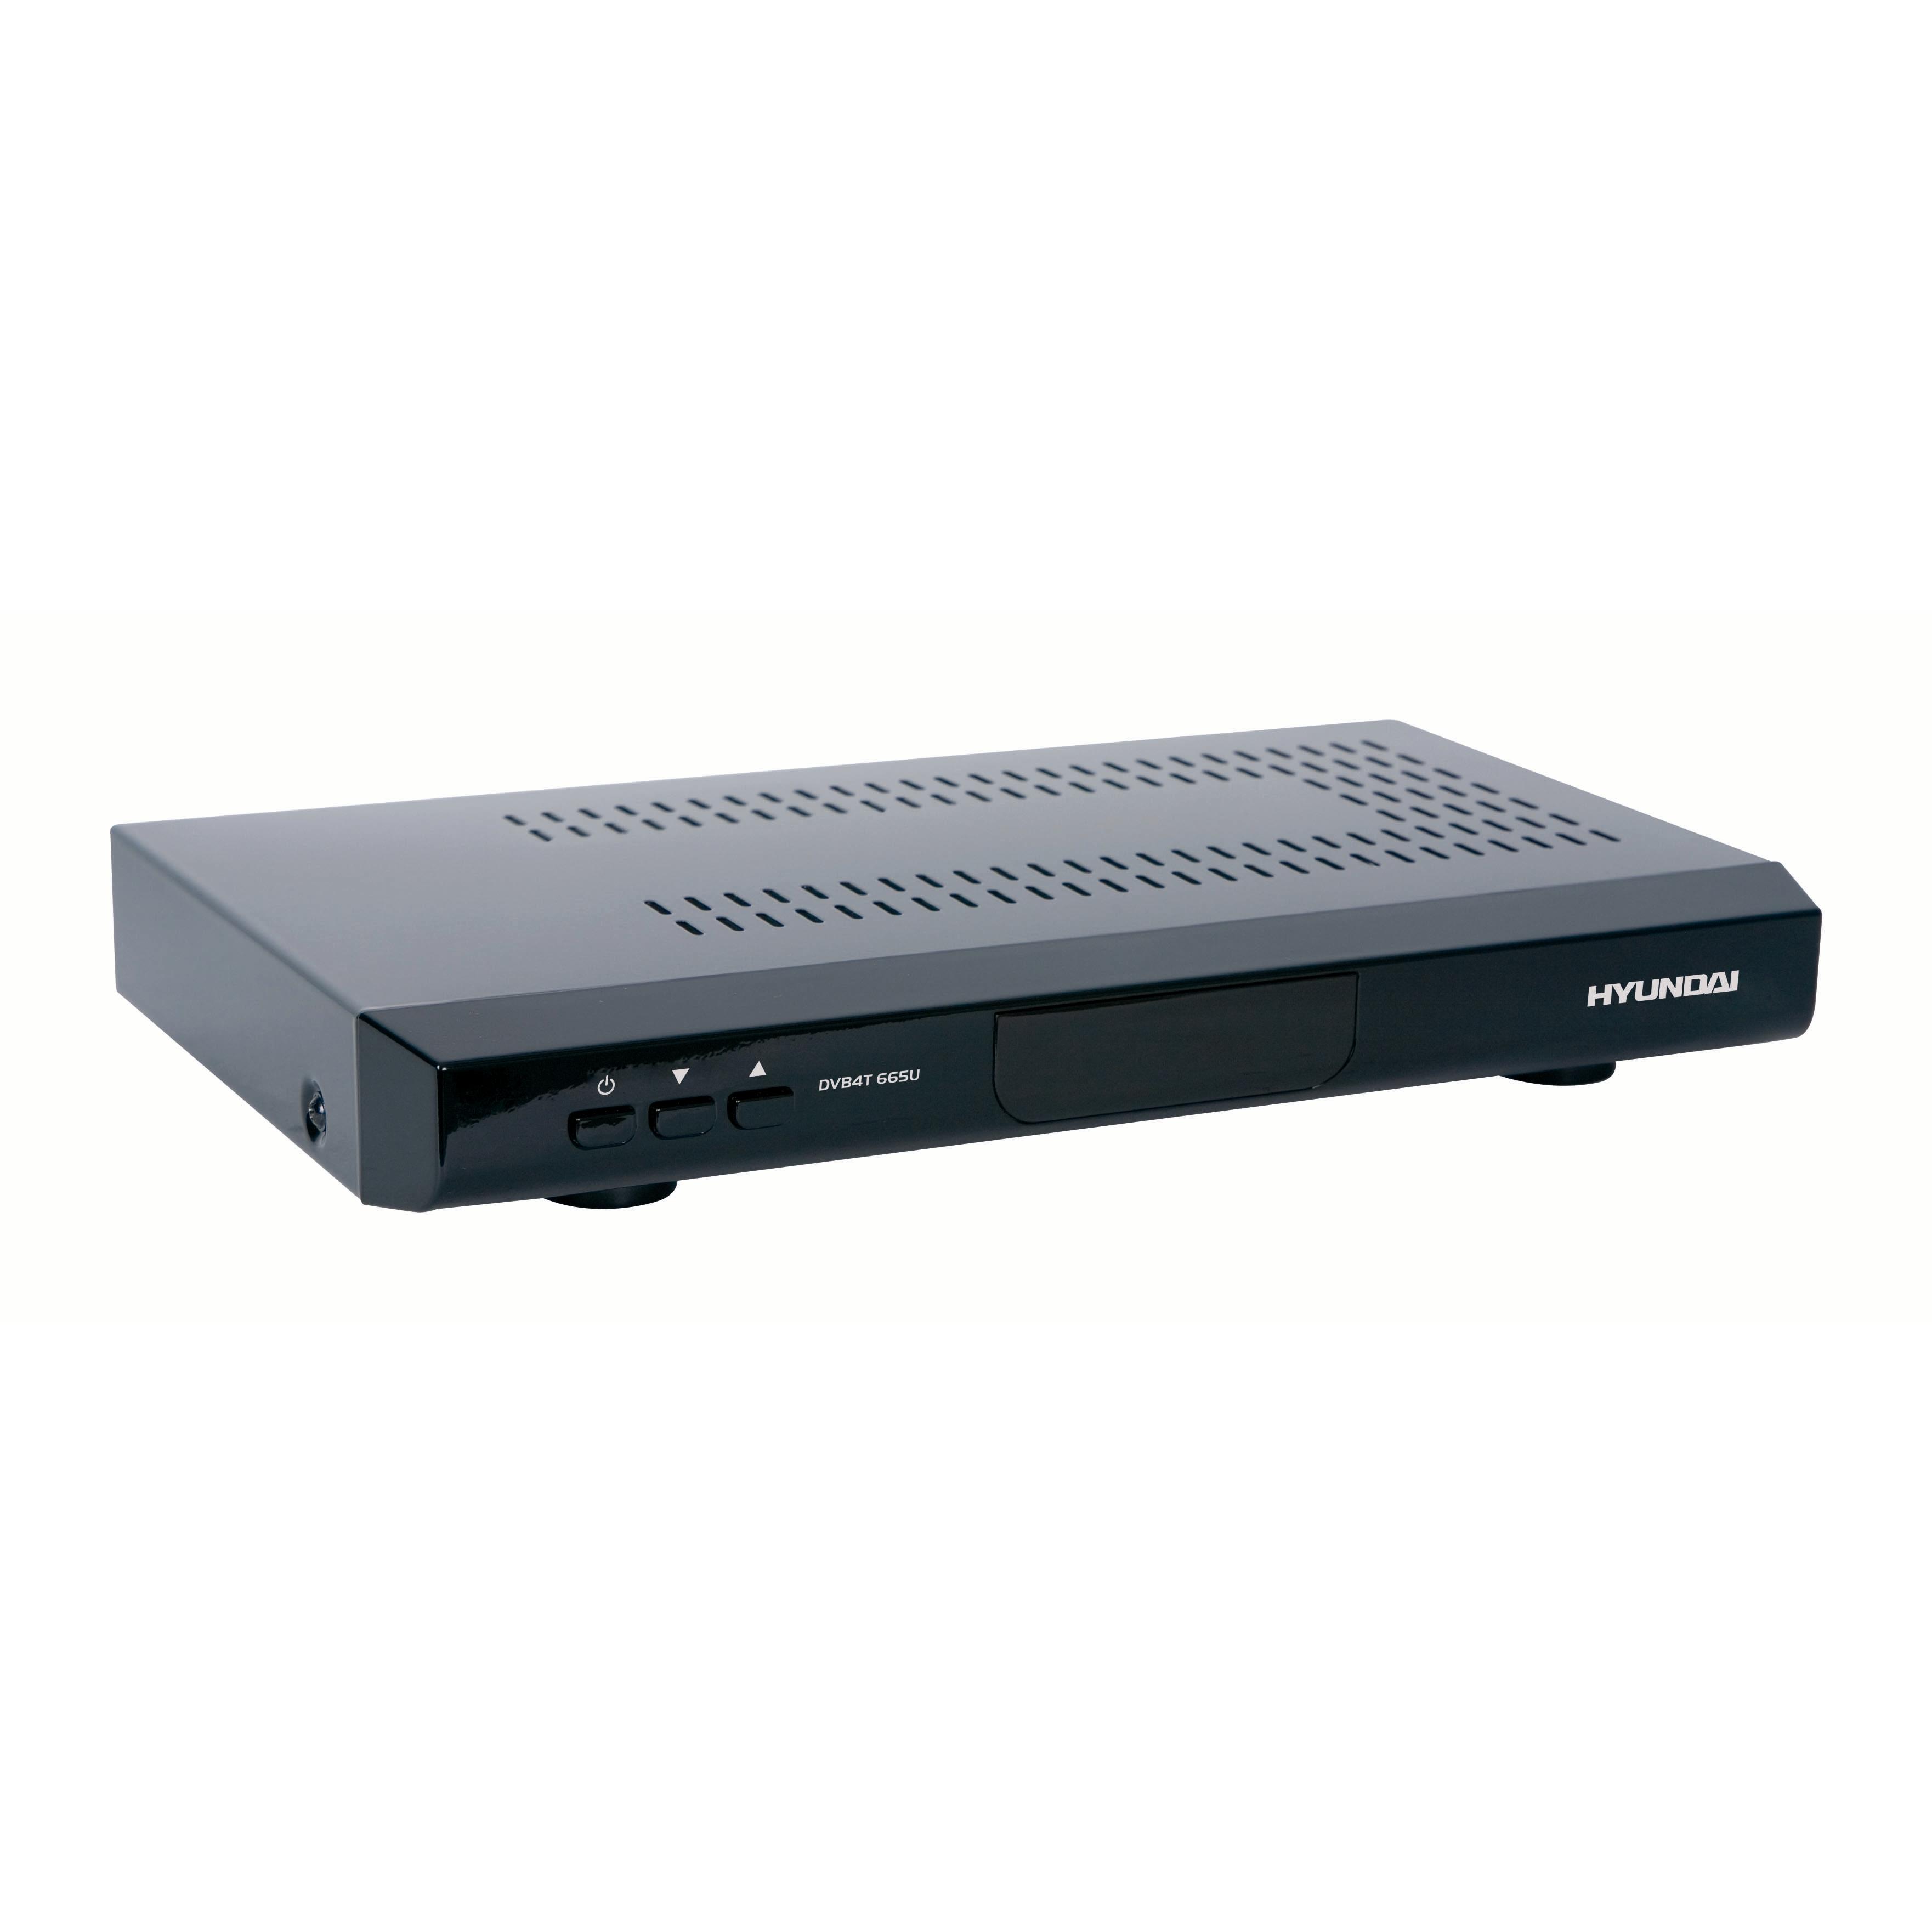 ge universal remote 11695 manual